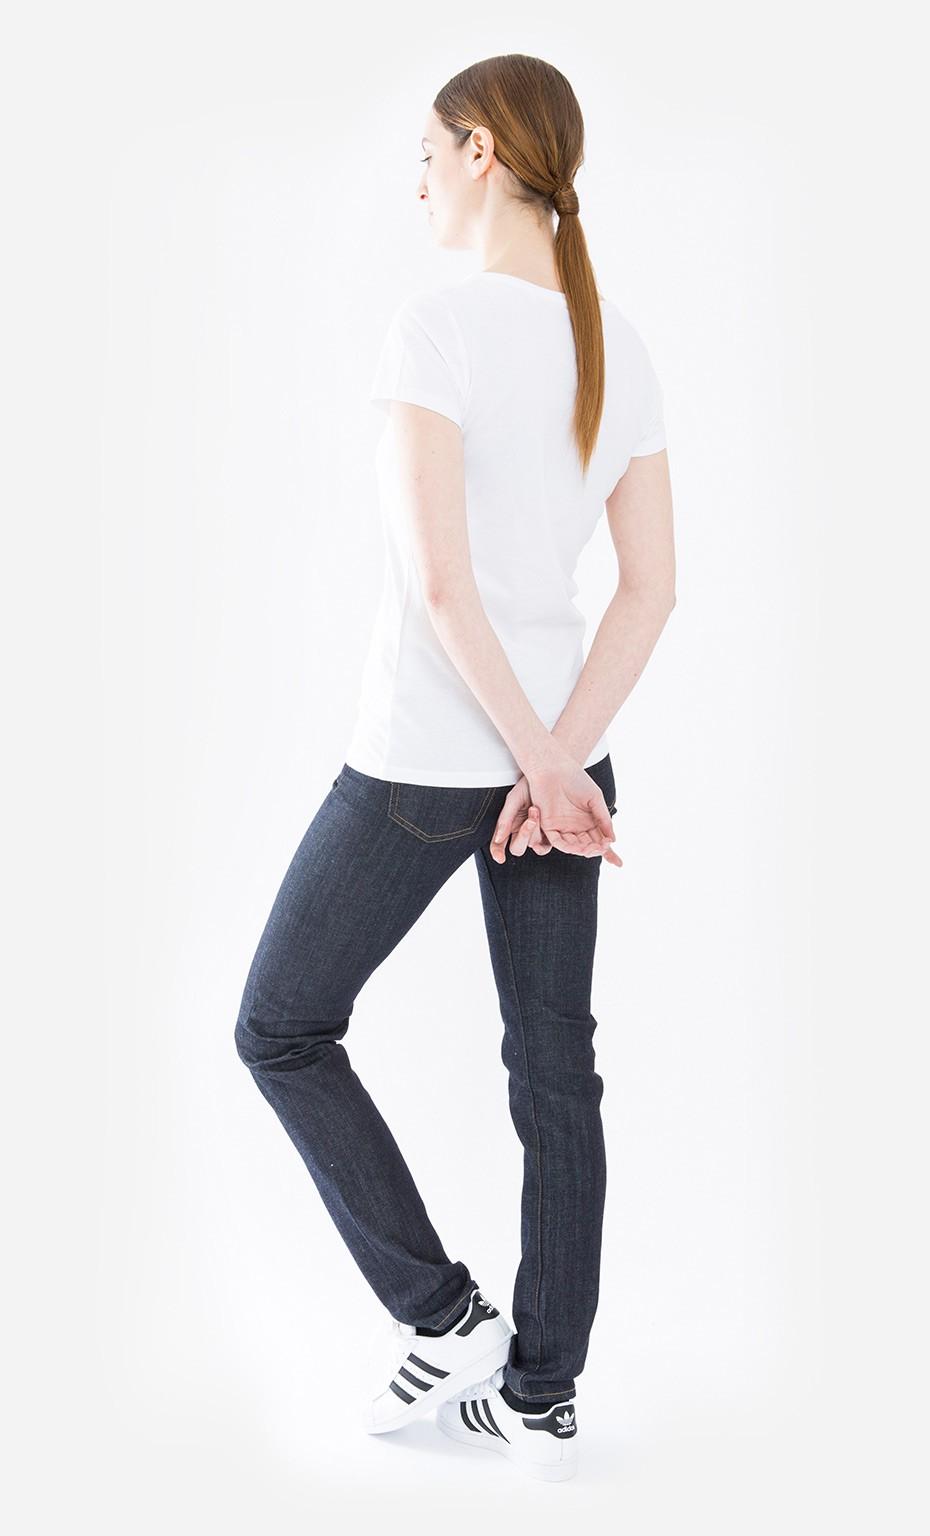 b943ae86a71 T-Shirt Femme Tendance